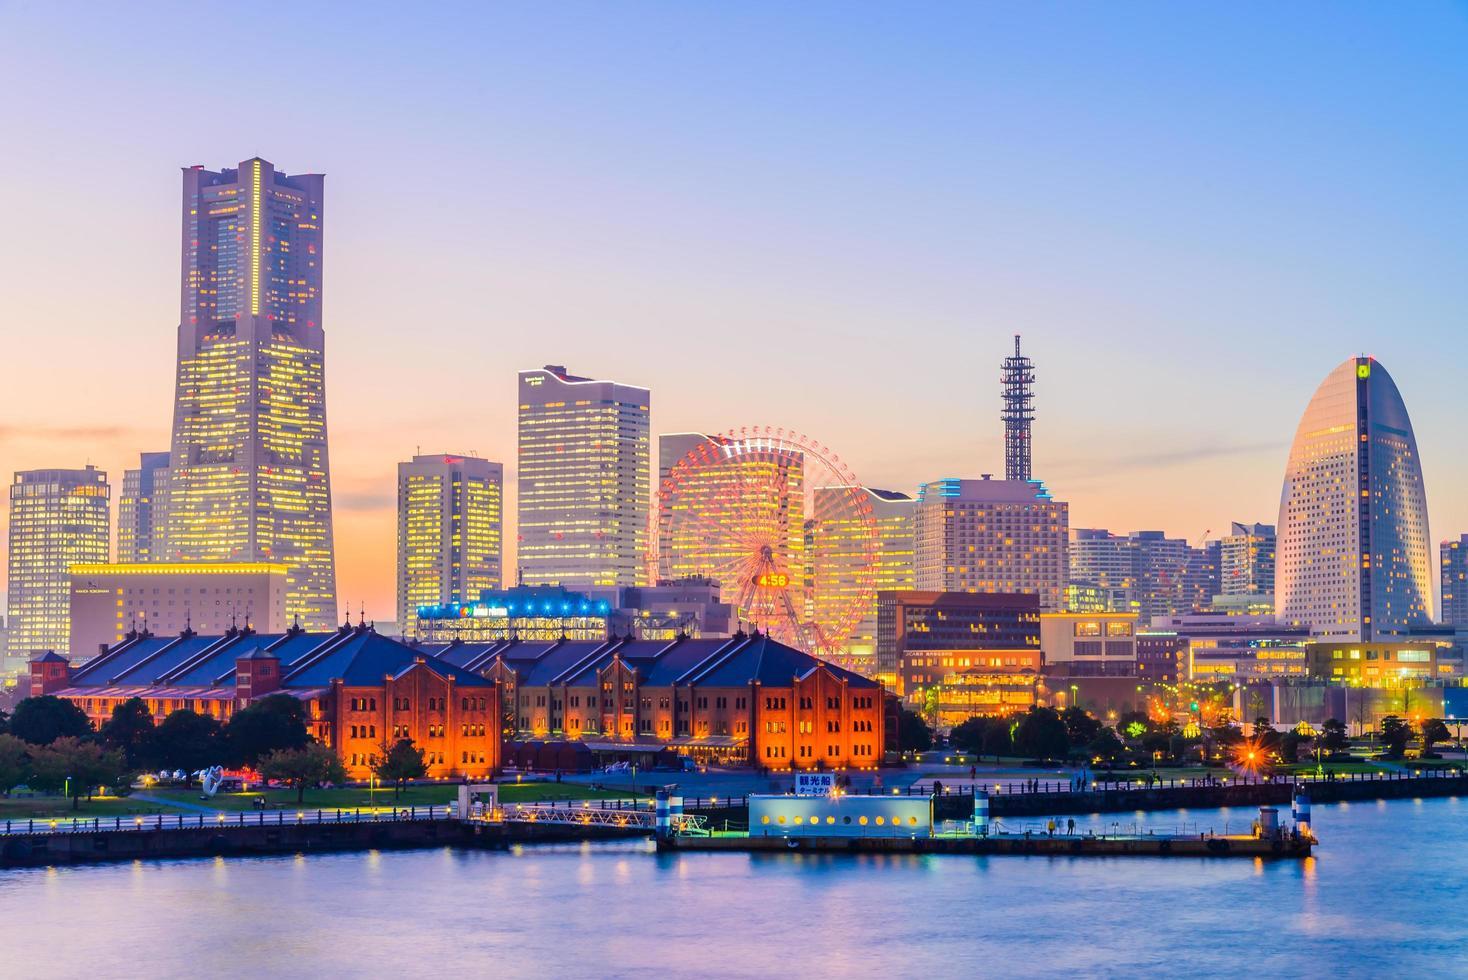 de skyline van de stad yokohama, japan foto